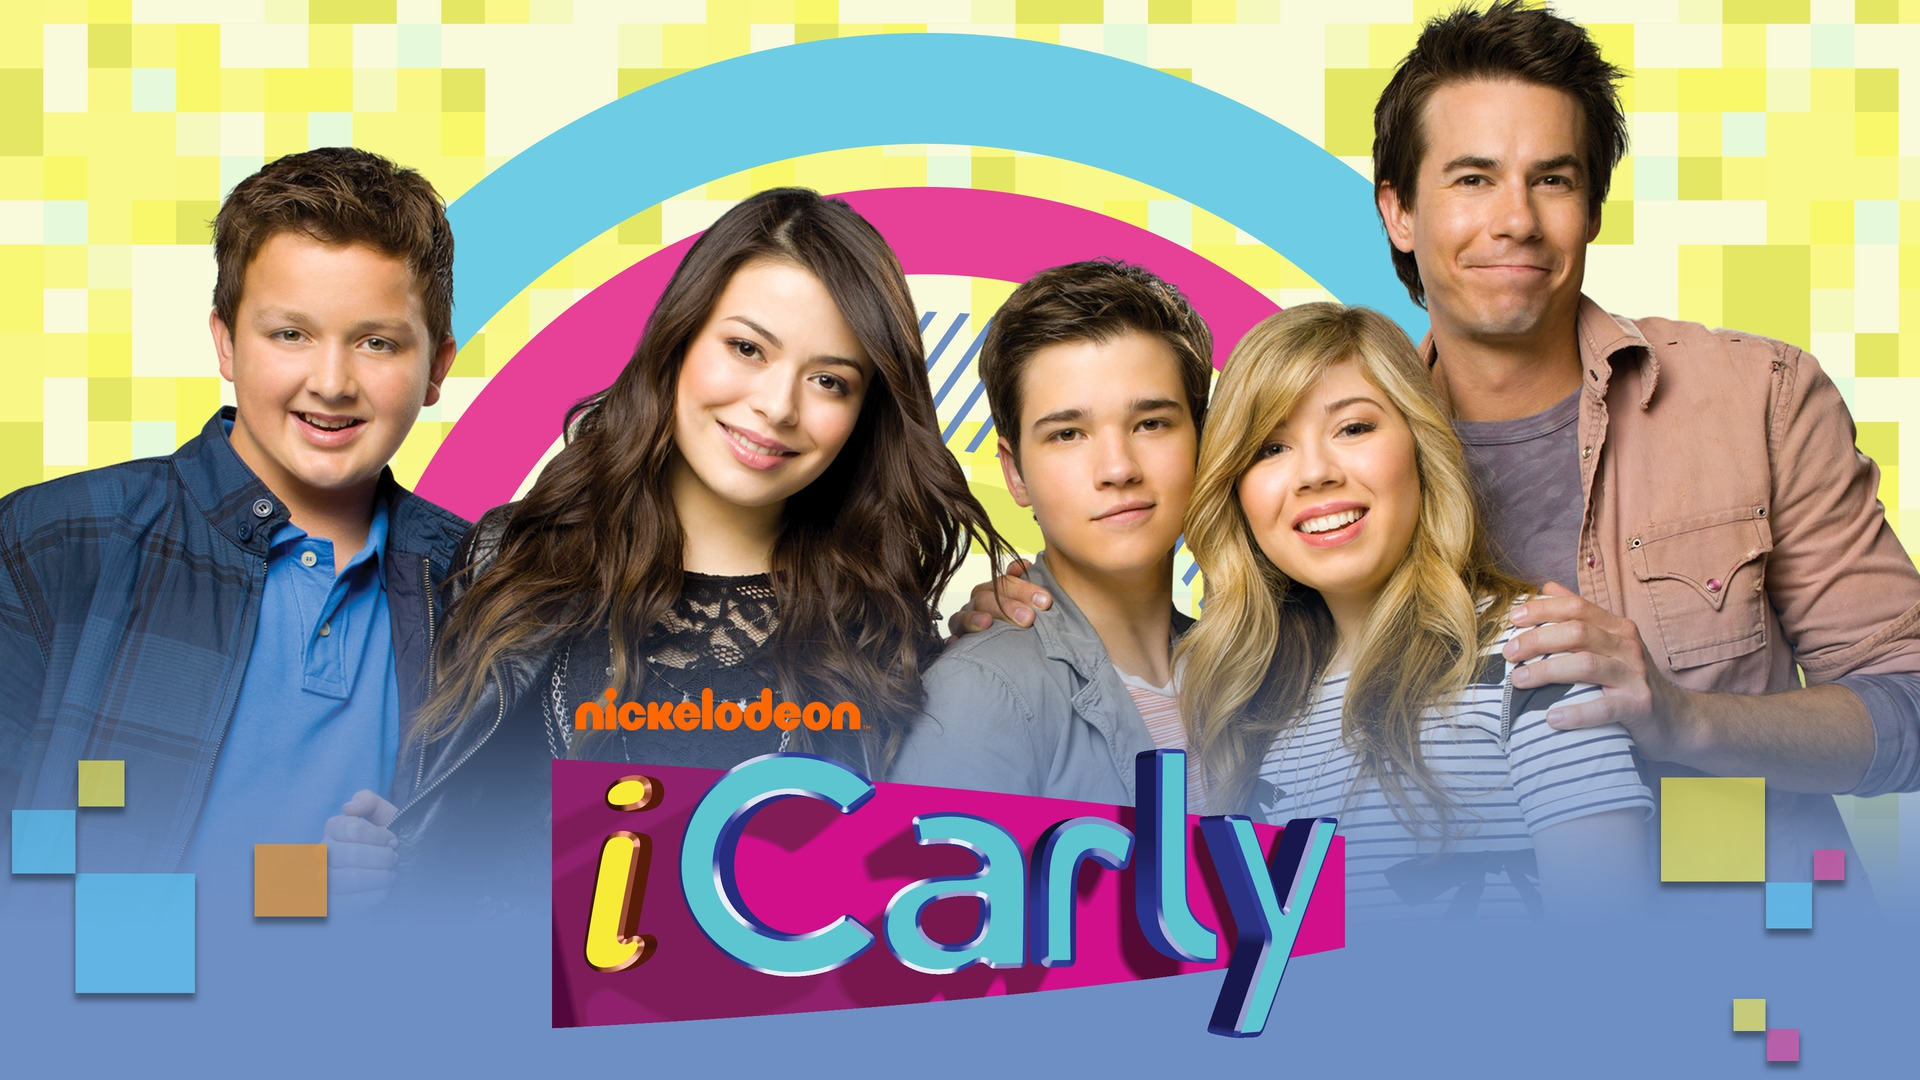 icarly - photo #13